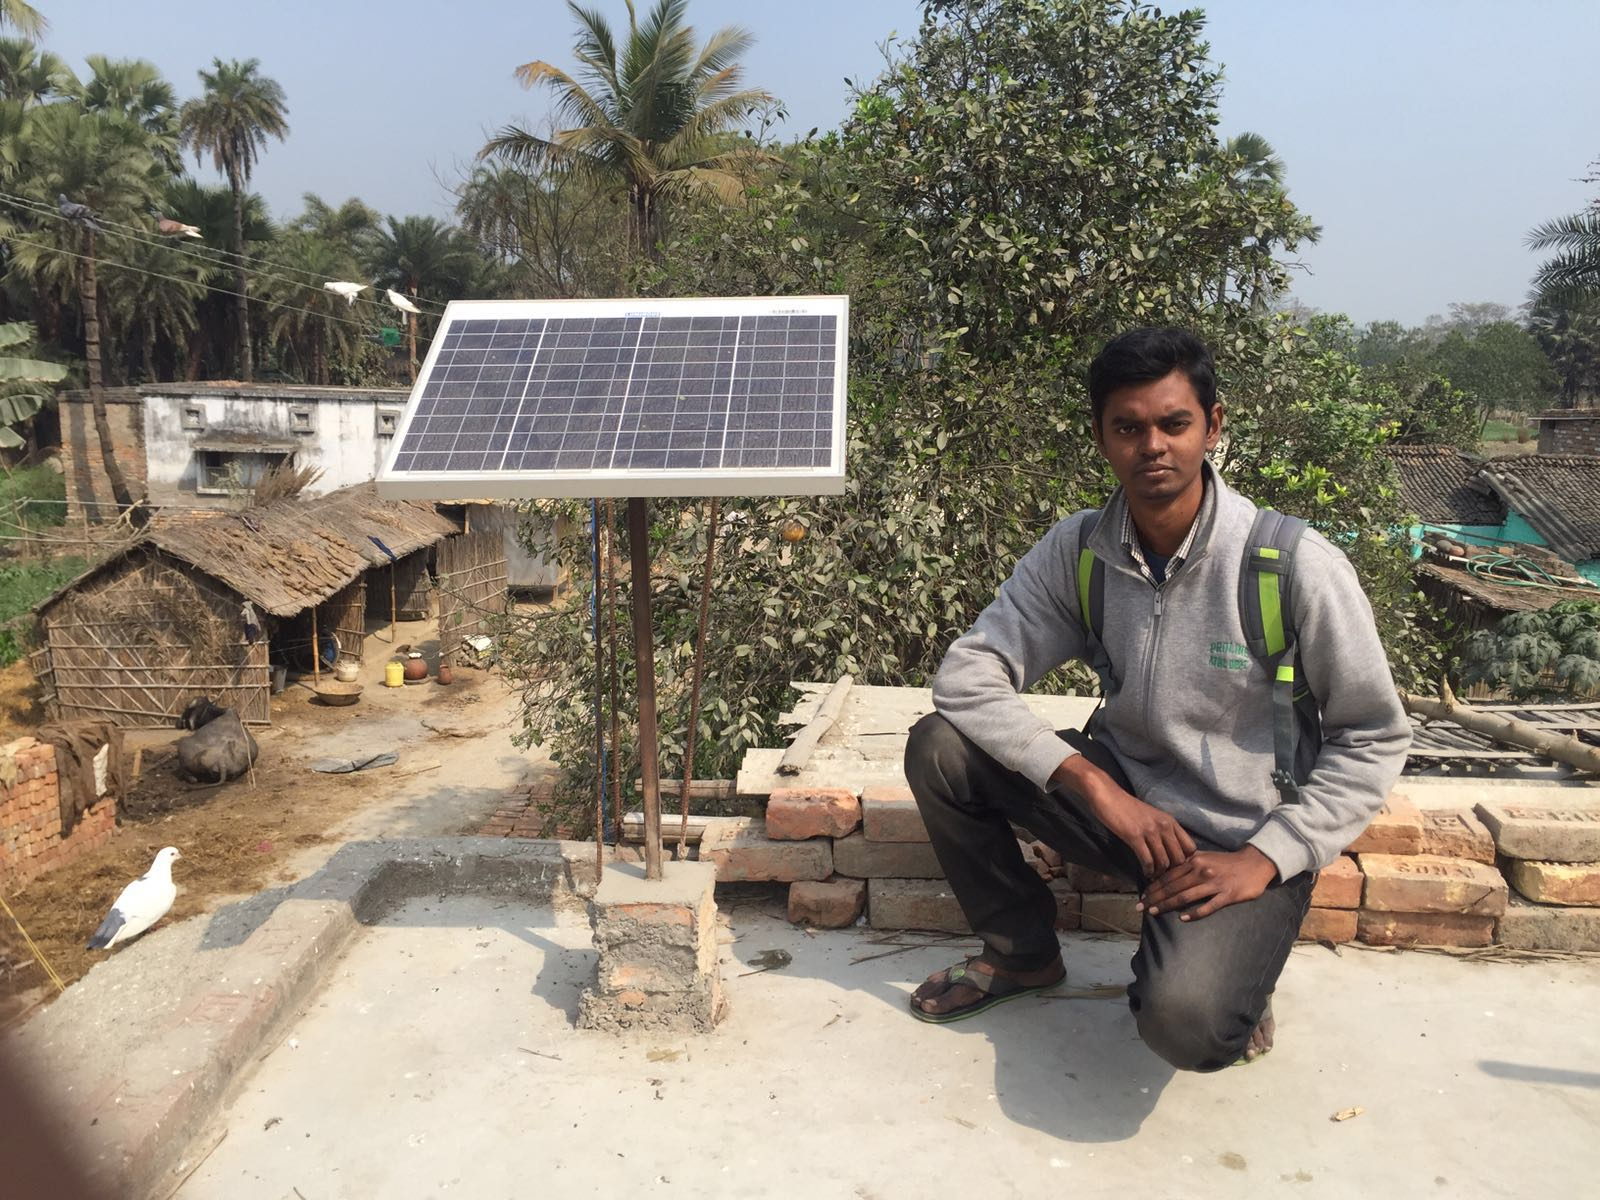 Sada with a solar panel